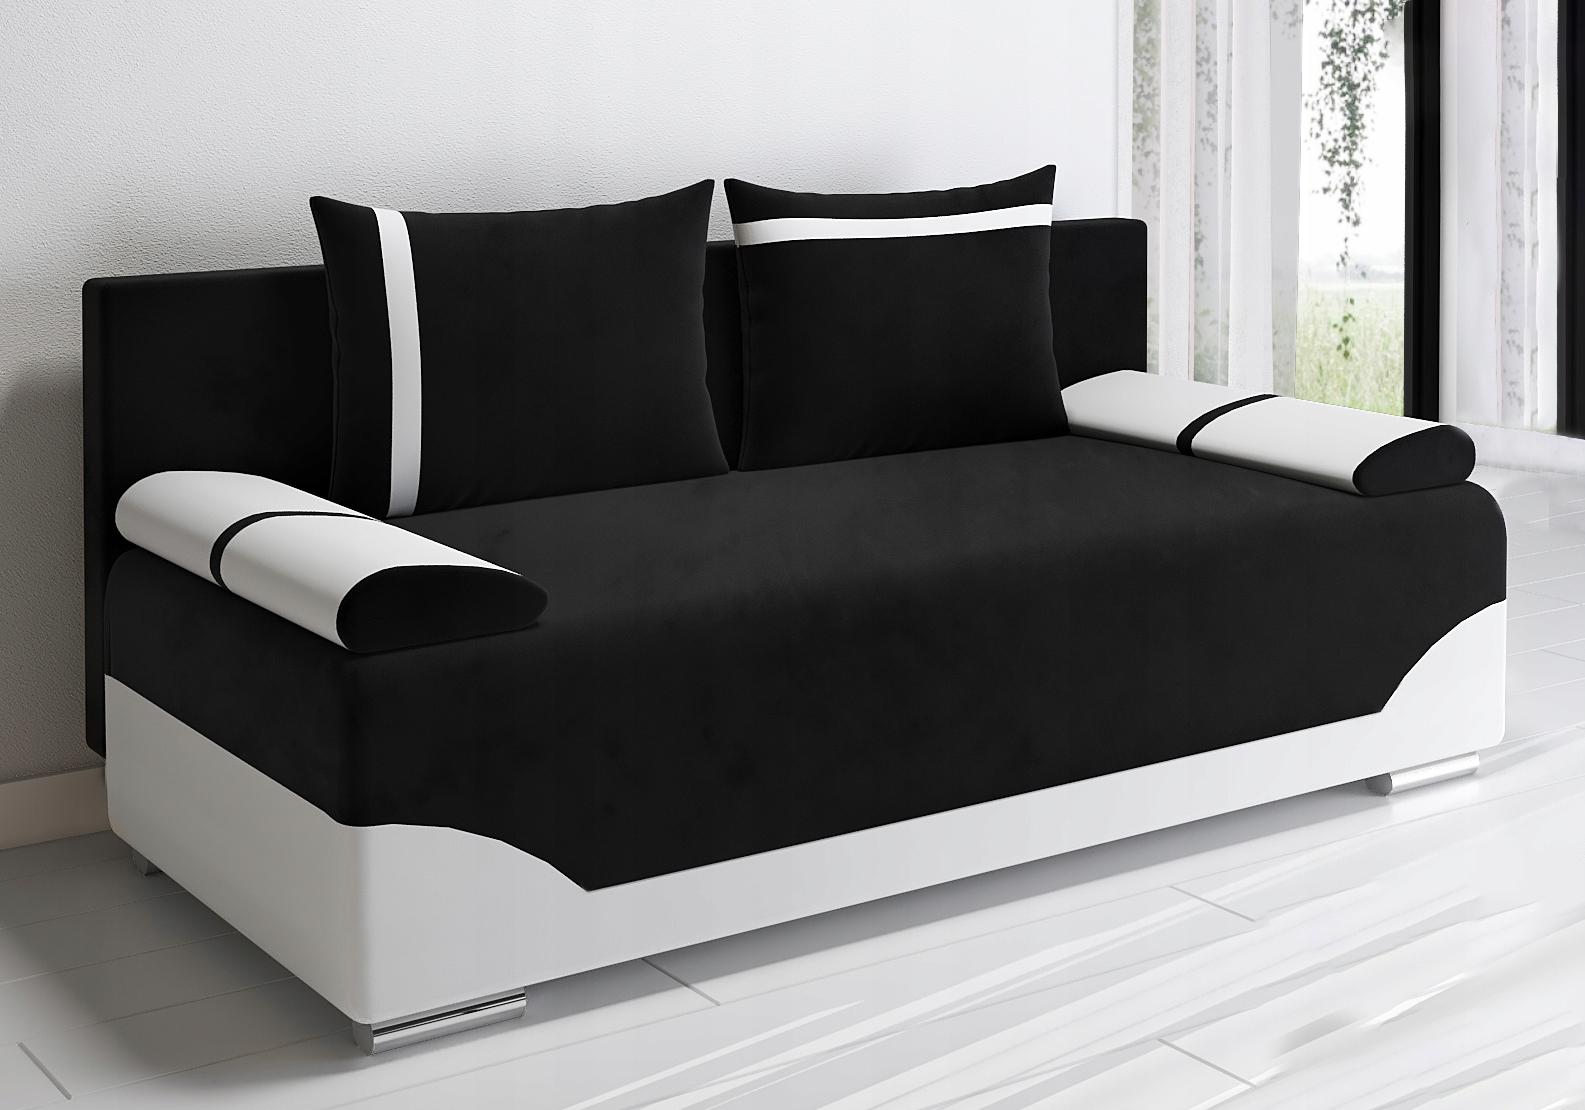 Диван раскладной диван RICCO диван + КОНТЕЙНЕР